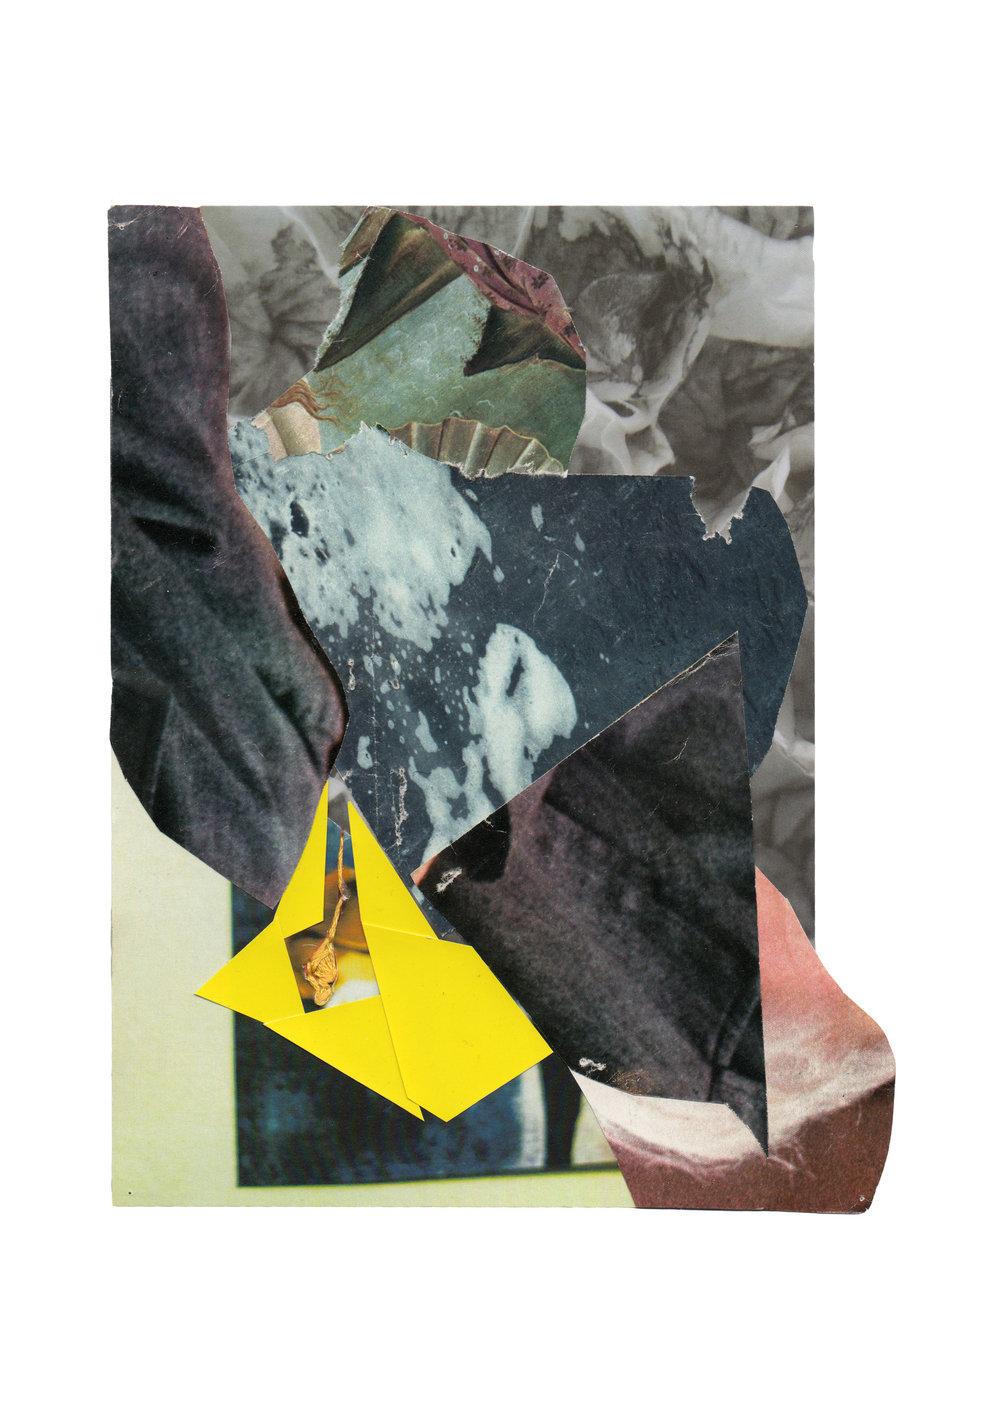 Volcan jaune, collage, 2013